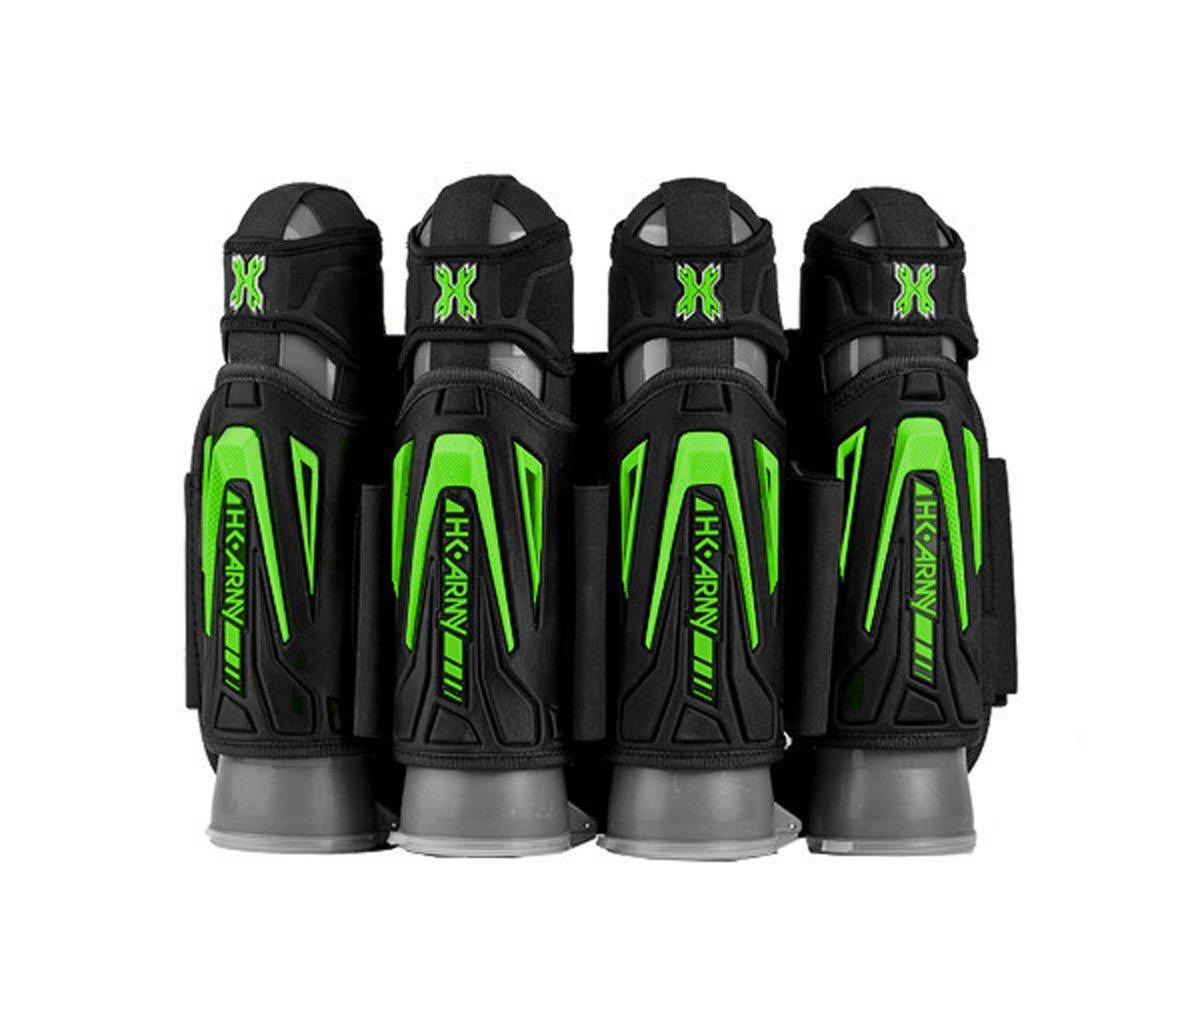 Slime 4 + 3 HK Army ZeroG Paintball Harness